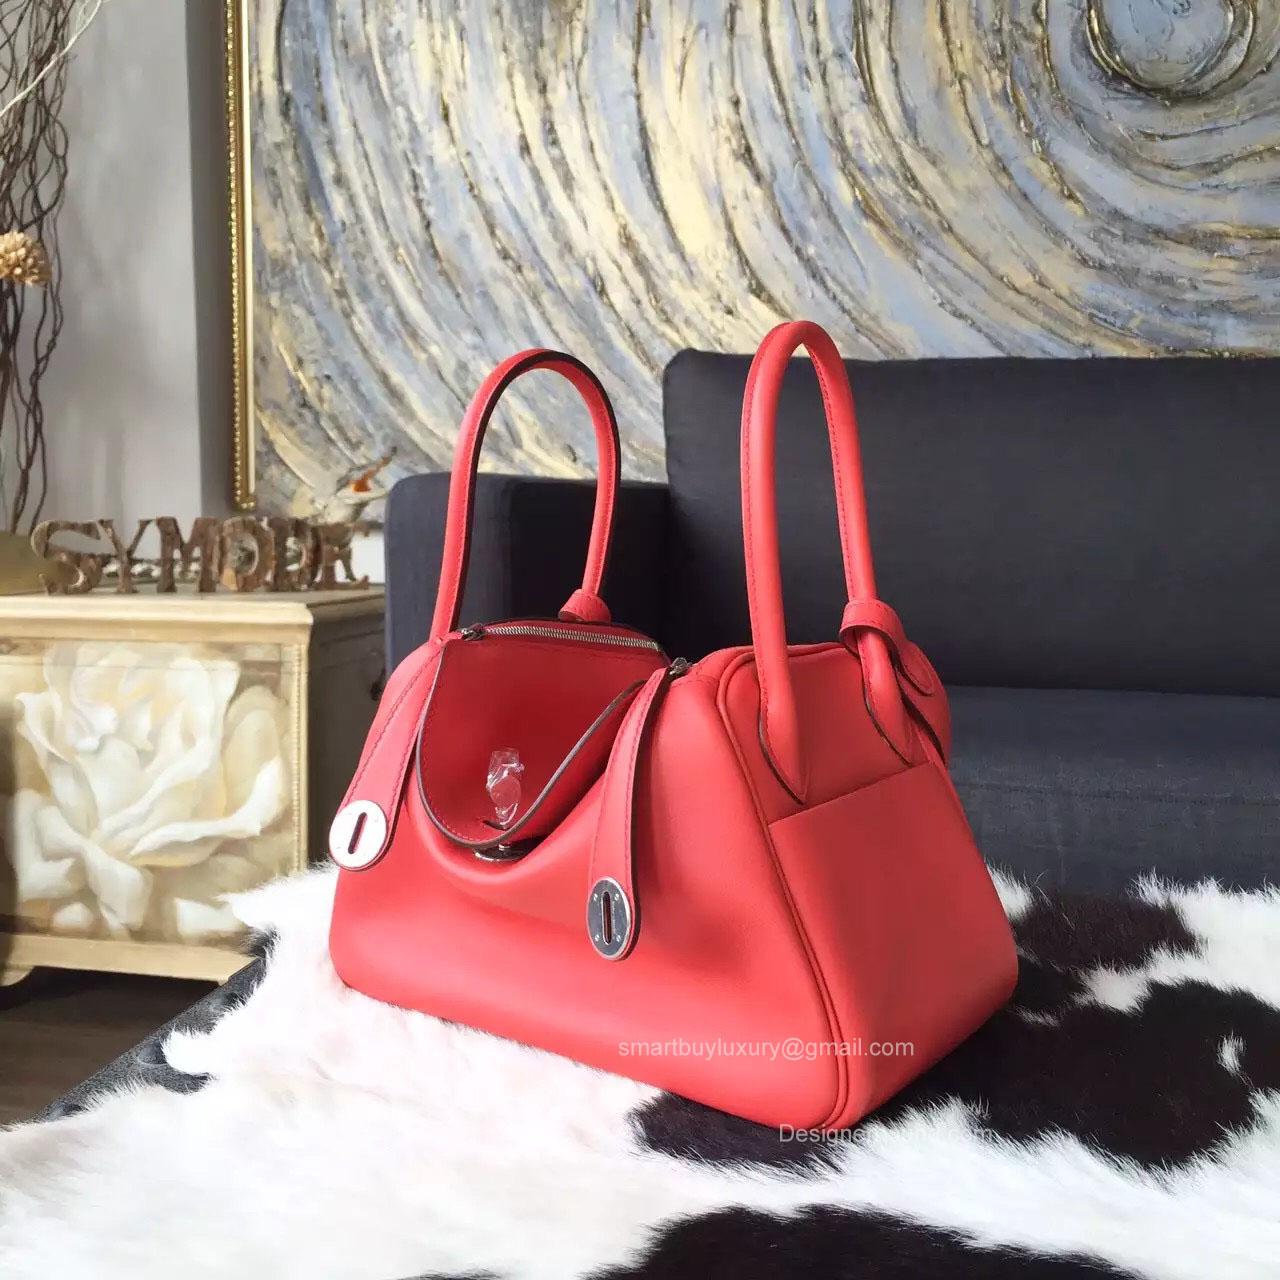 hermes red exotic leathers handbag lindy